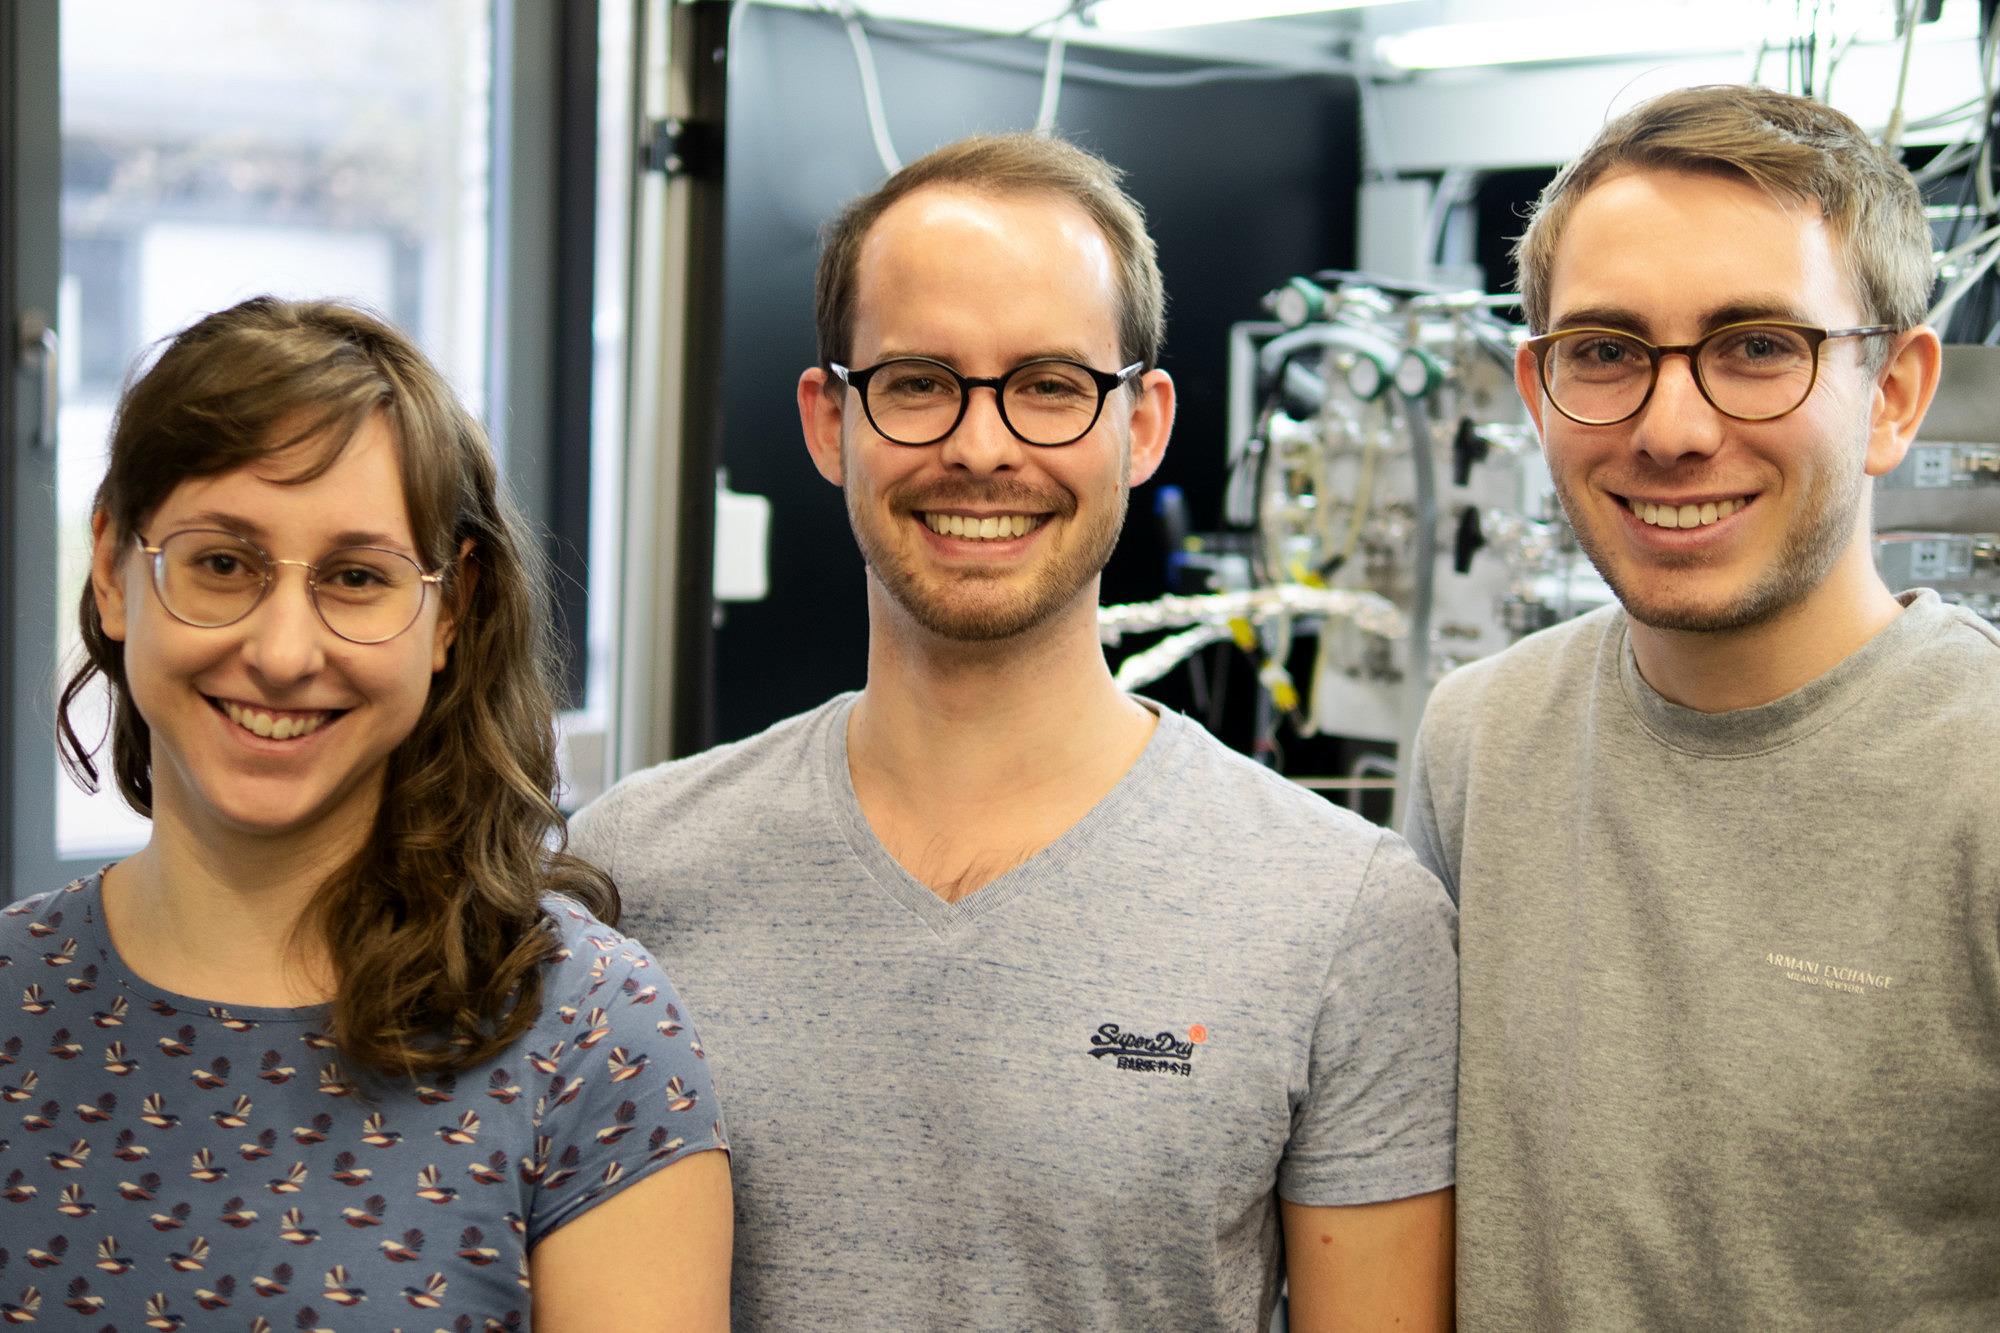 CIRCAT-Team (Dr. Tanja Bauer, Simon Schötz, Dominik Blaumeiser)